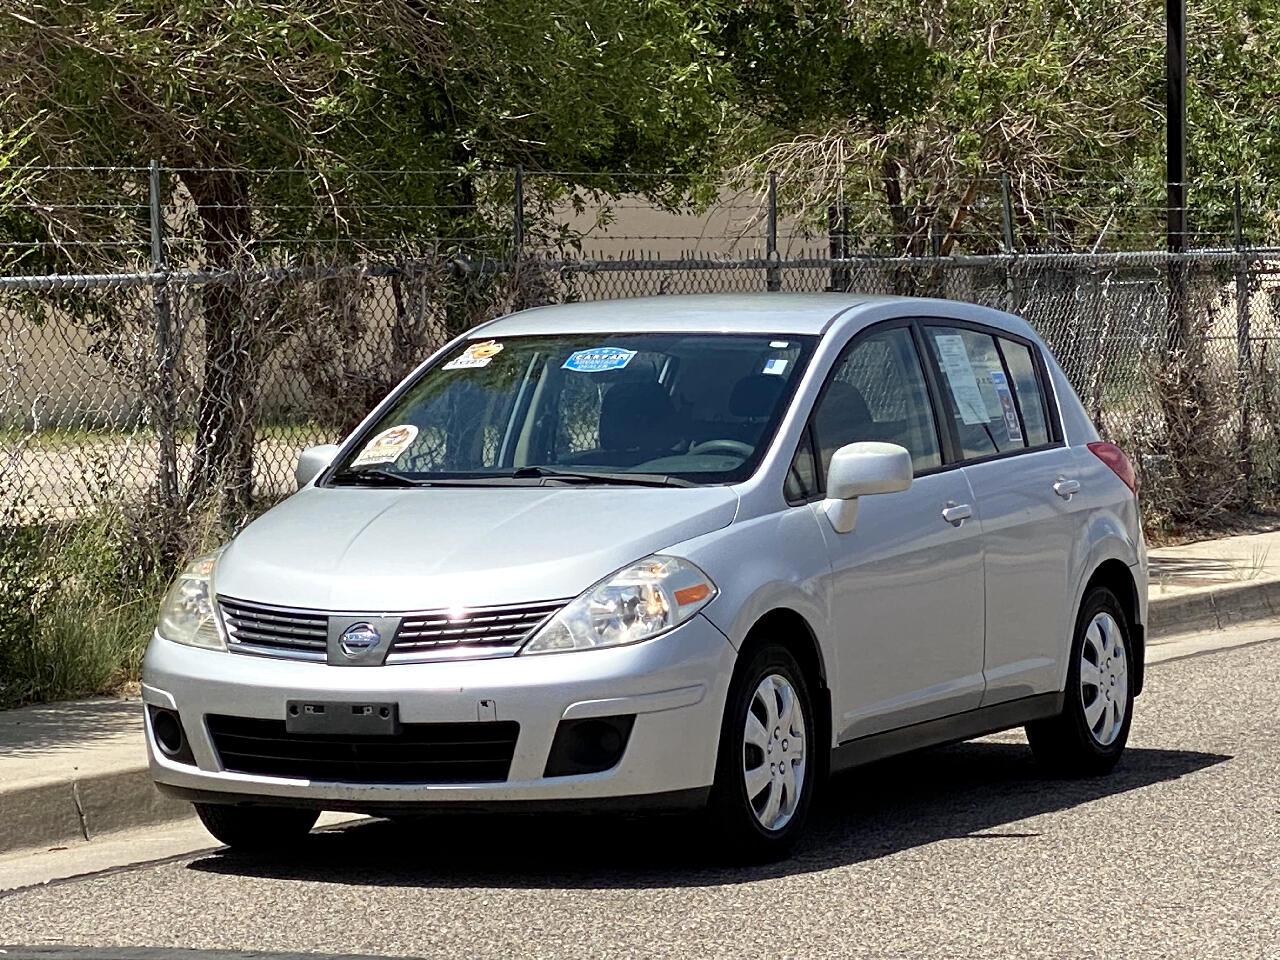 2007 Nissan Versa 5dr HB I4 Auto 1.8 S